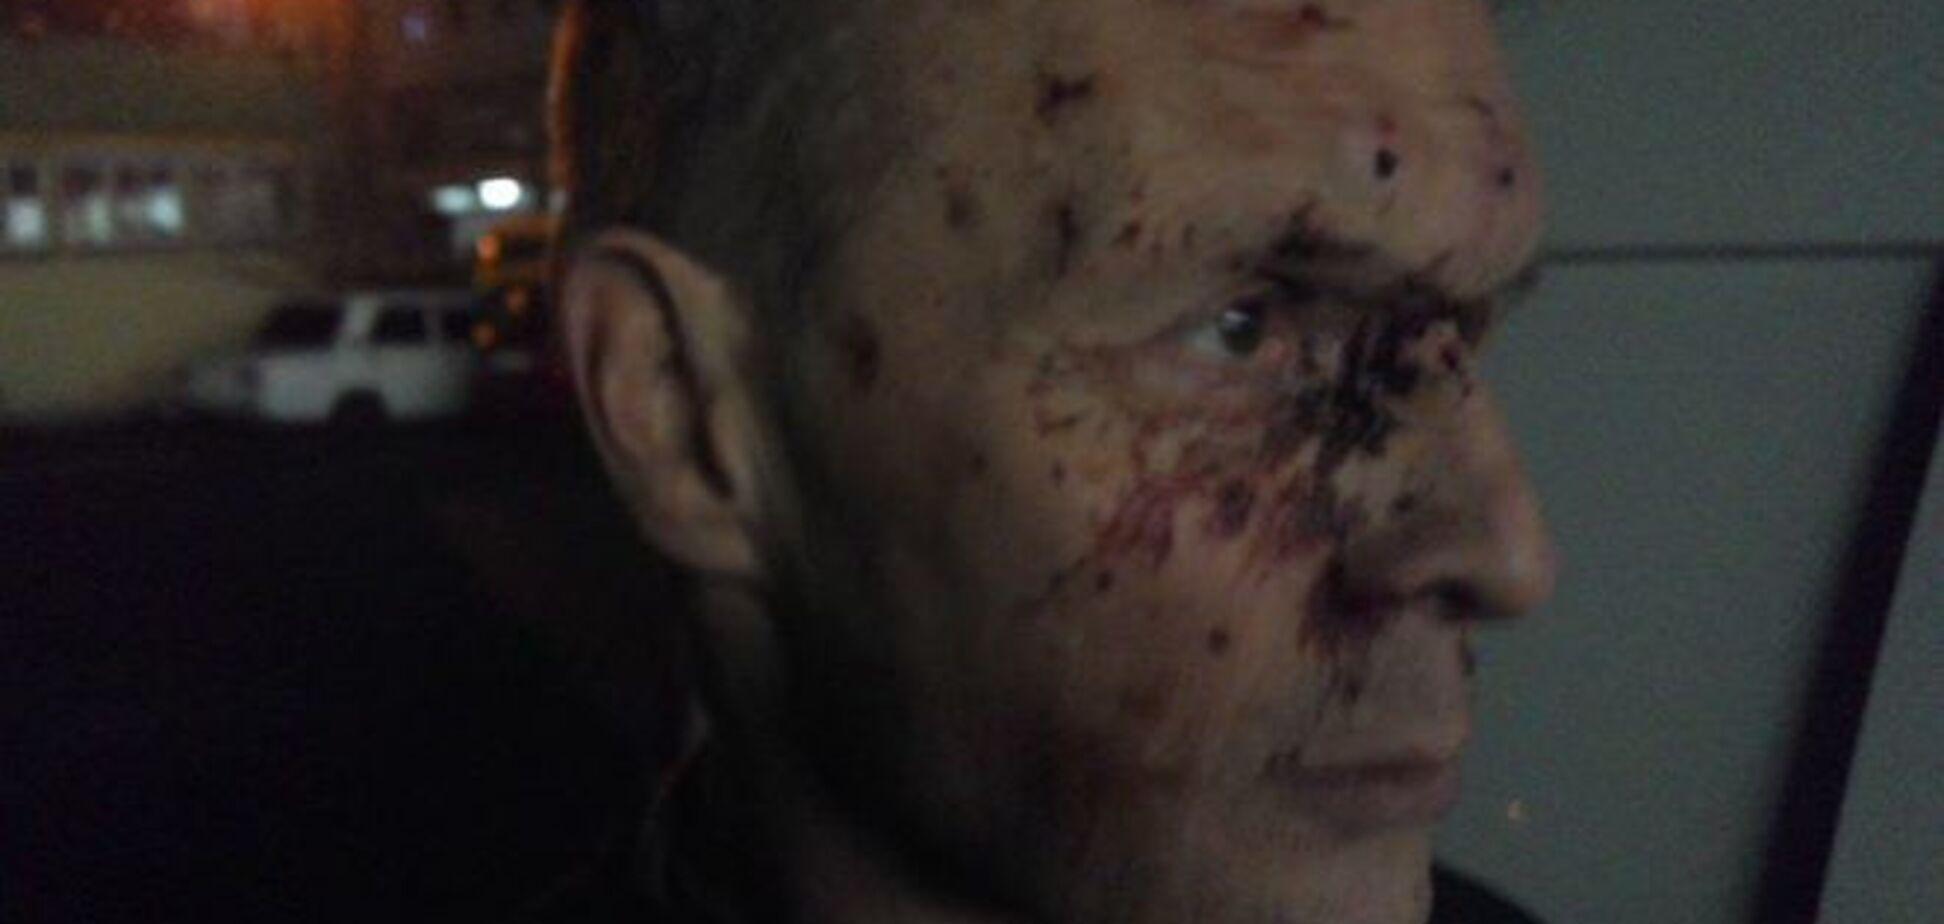 В Киеве мажор жестоко избил отца добровольца из 'Азова': опубликовано фото